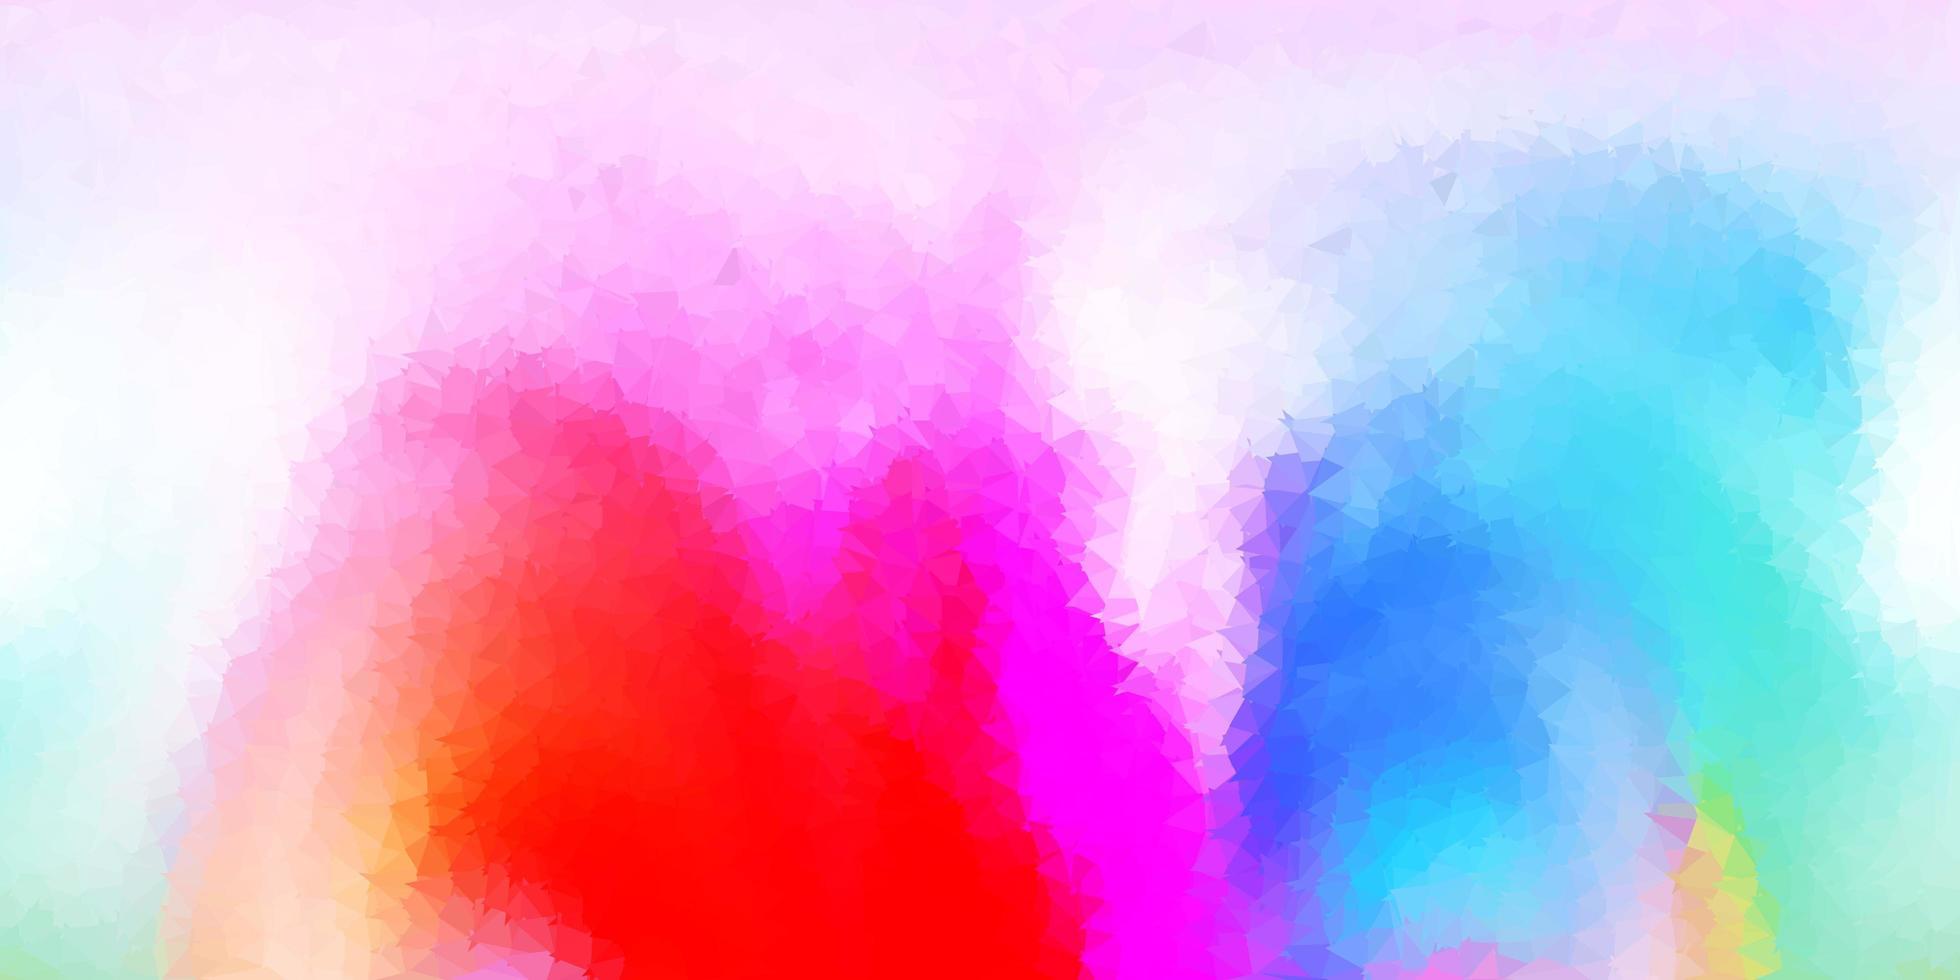 cenário poligonal de luz multicolor vetor. vetor